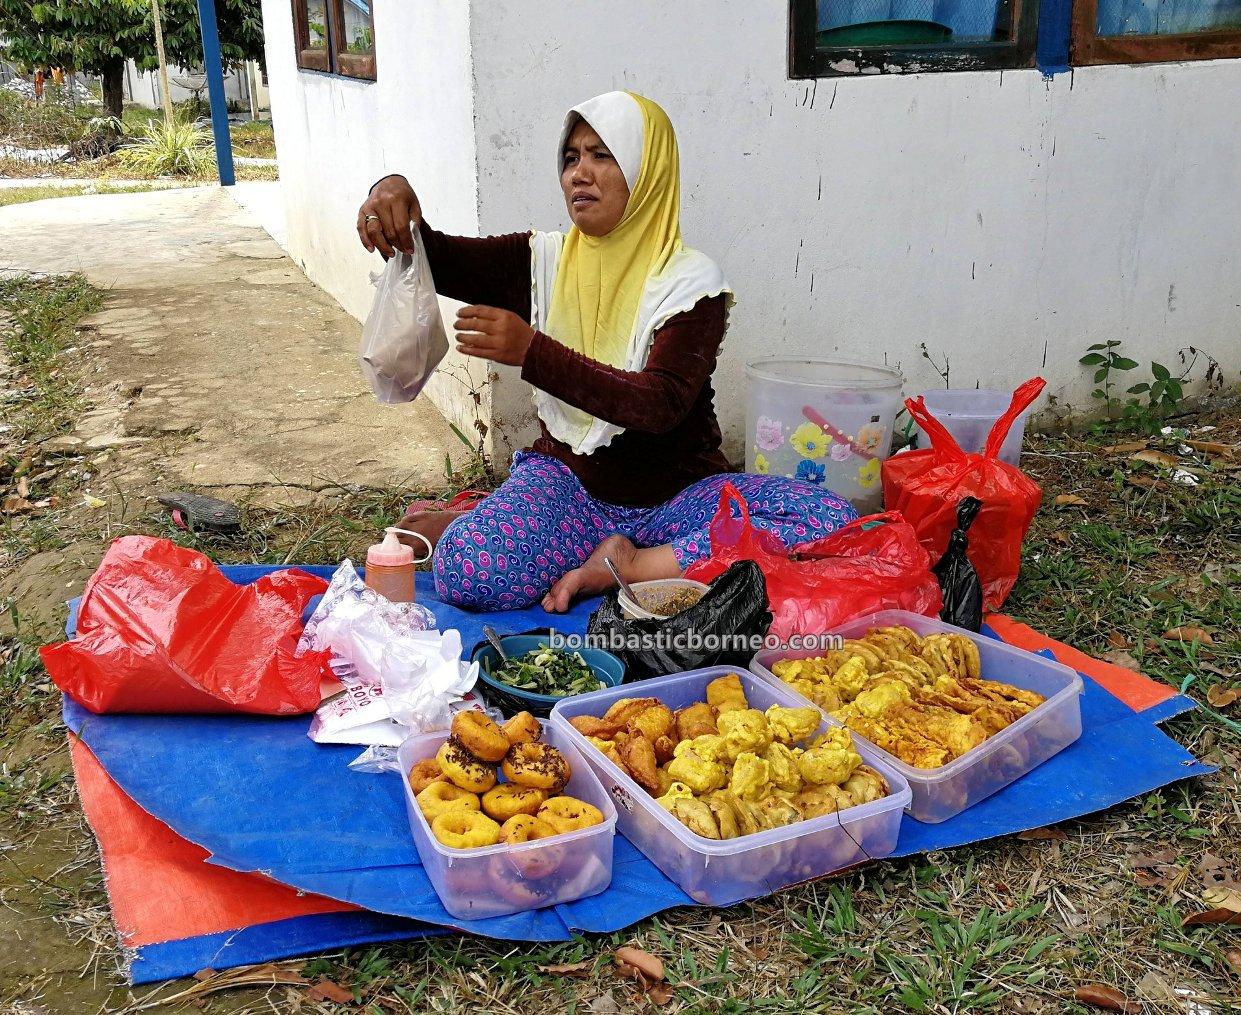 backpackers, Borneo, Putussibau, Obyek wisata, Tourism, tourist attraction, Travel Guide, 婆罗洲西加里曼丹